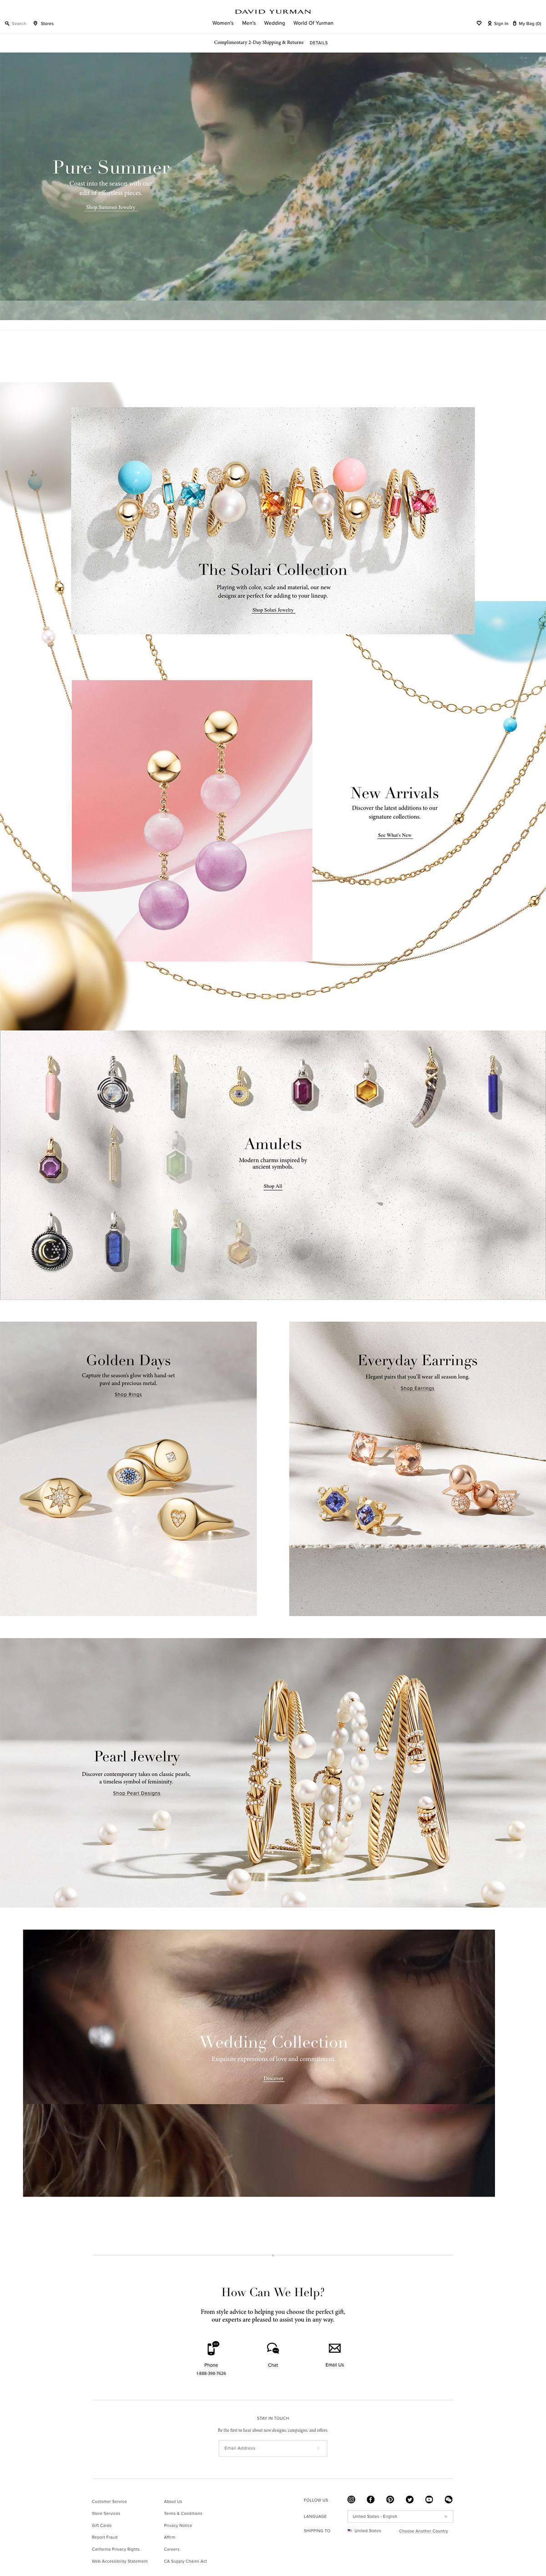 eCommerce website: David Yurman